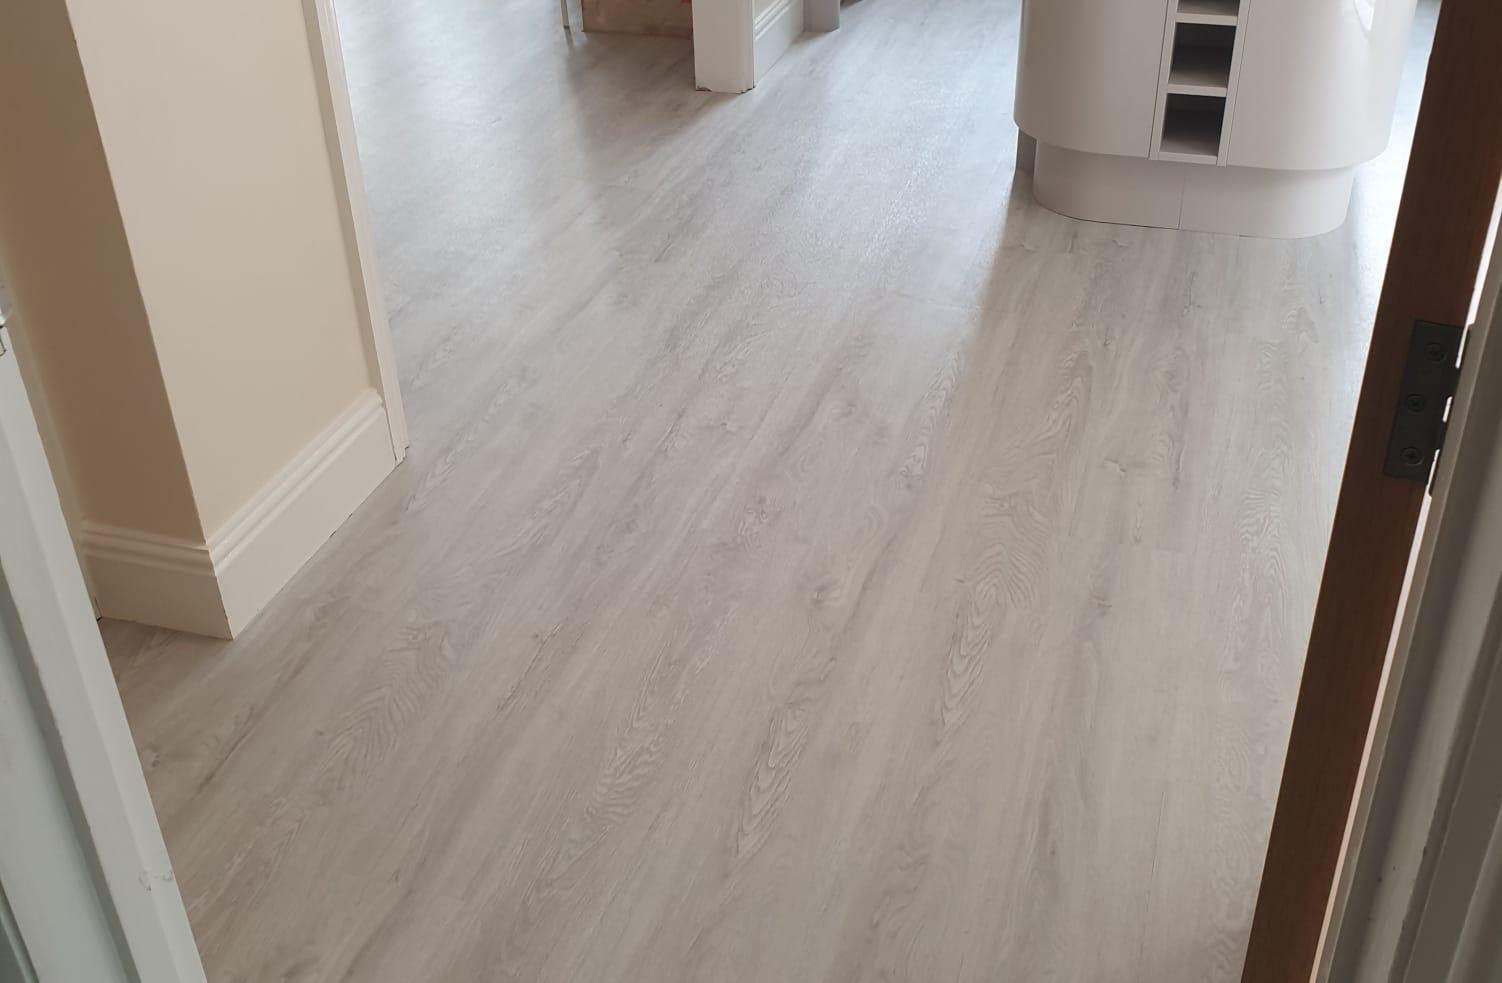 Karndean flooring specialist basingstoke